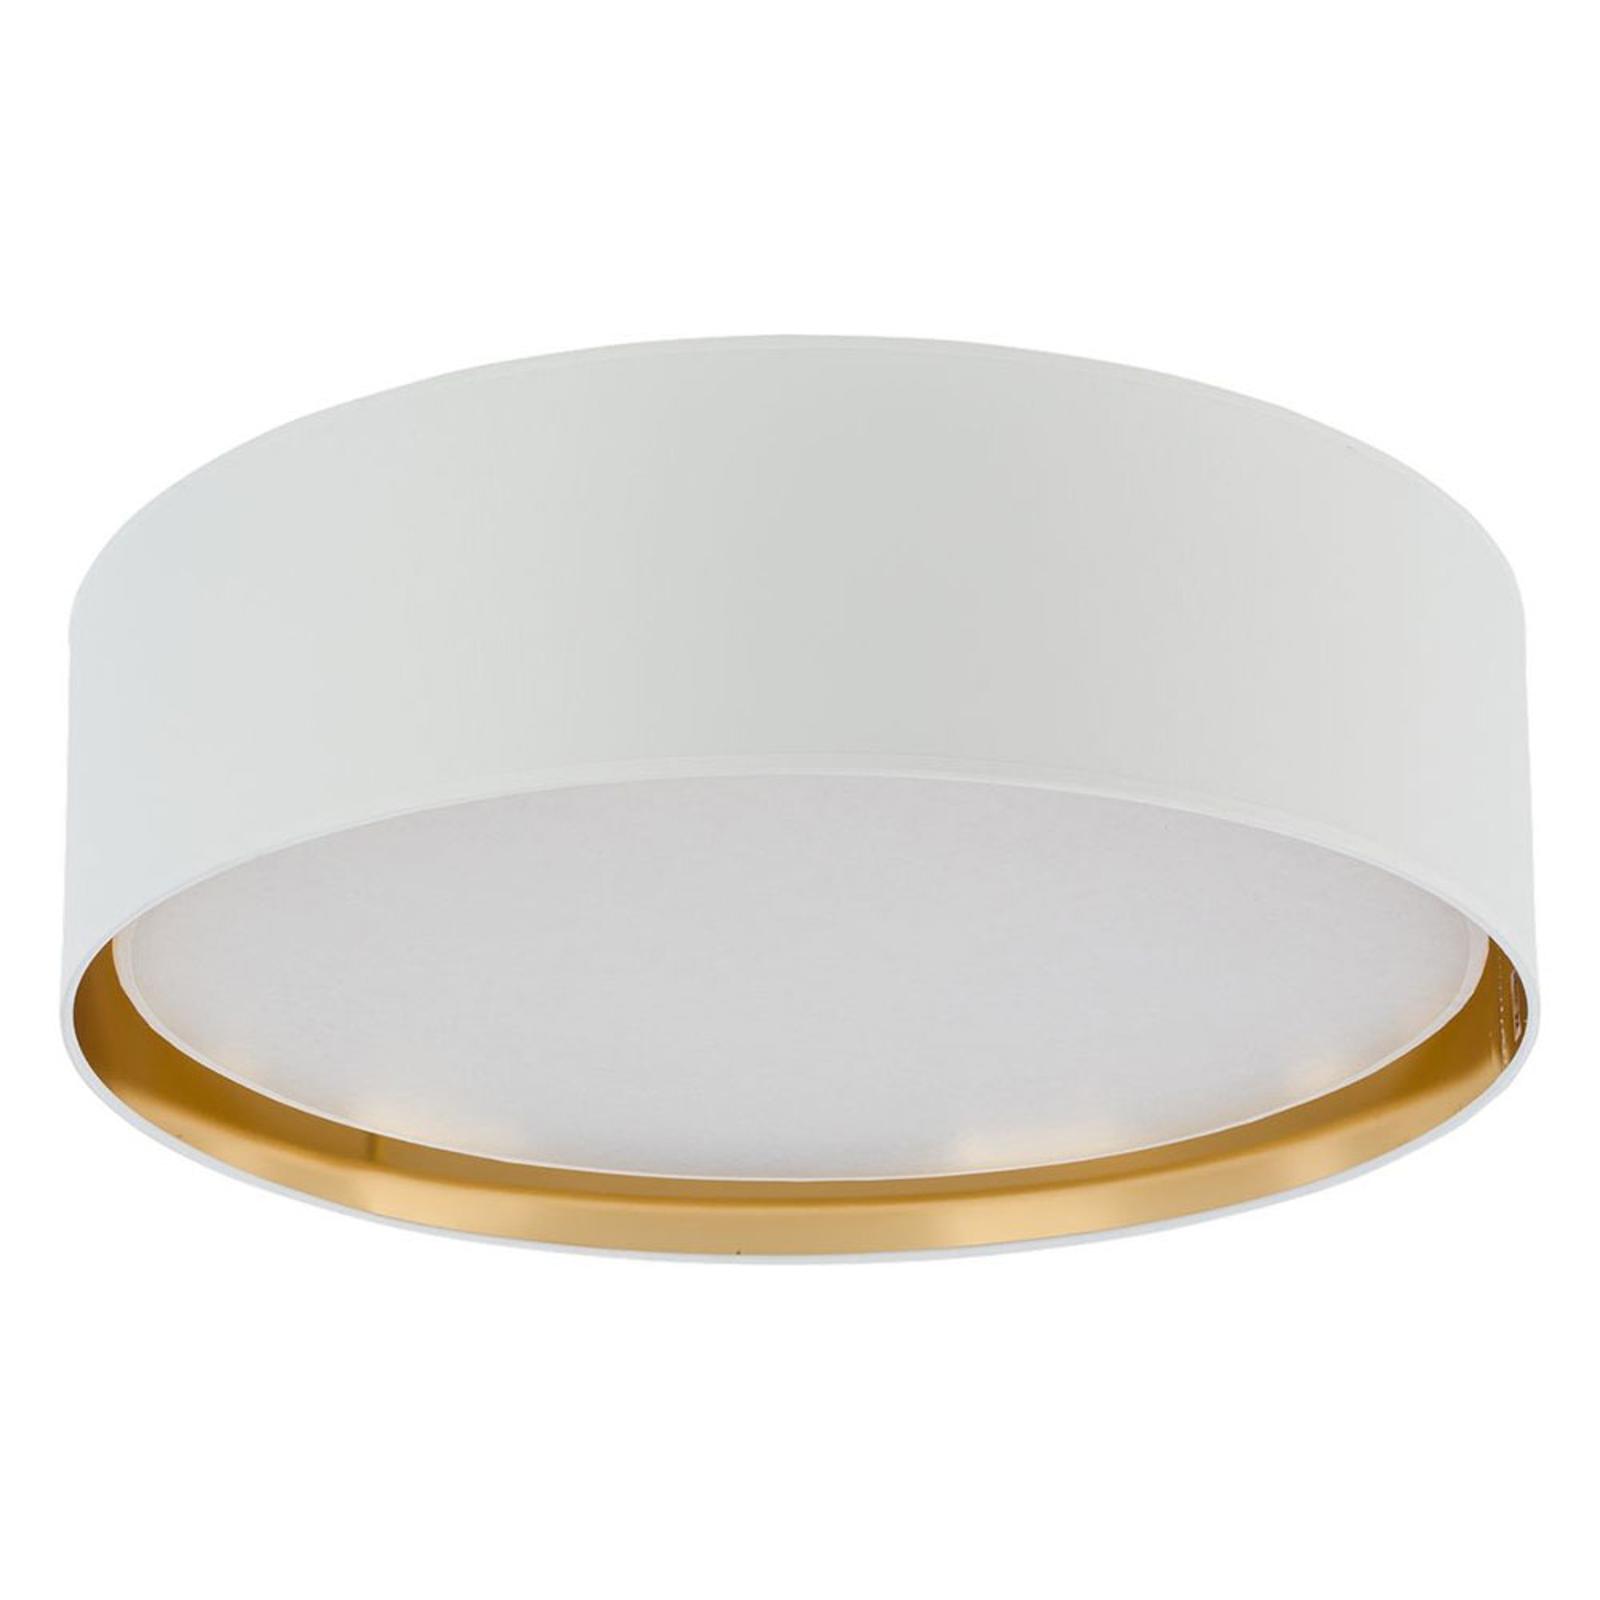 Plafondlamp Bilbao, Ø 60 cm, wit/goud